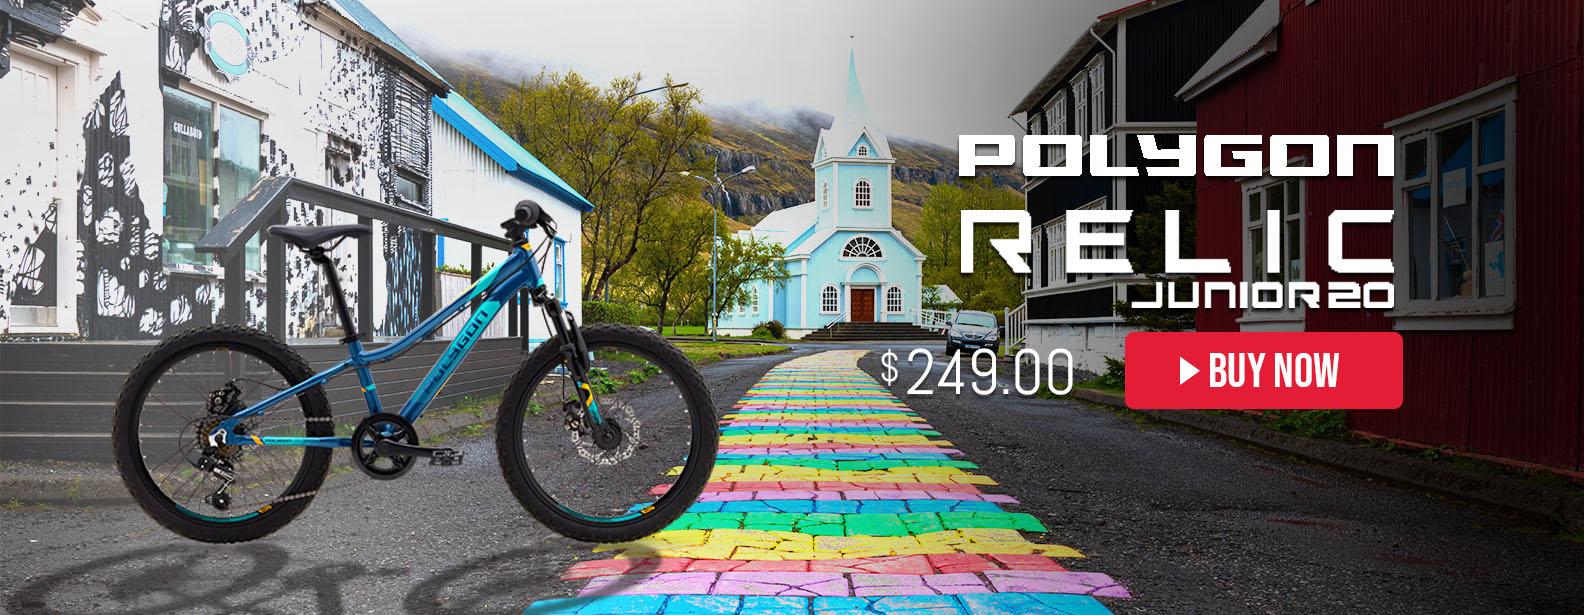 Polygon Relic 20 Mountain Bike Junior